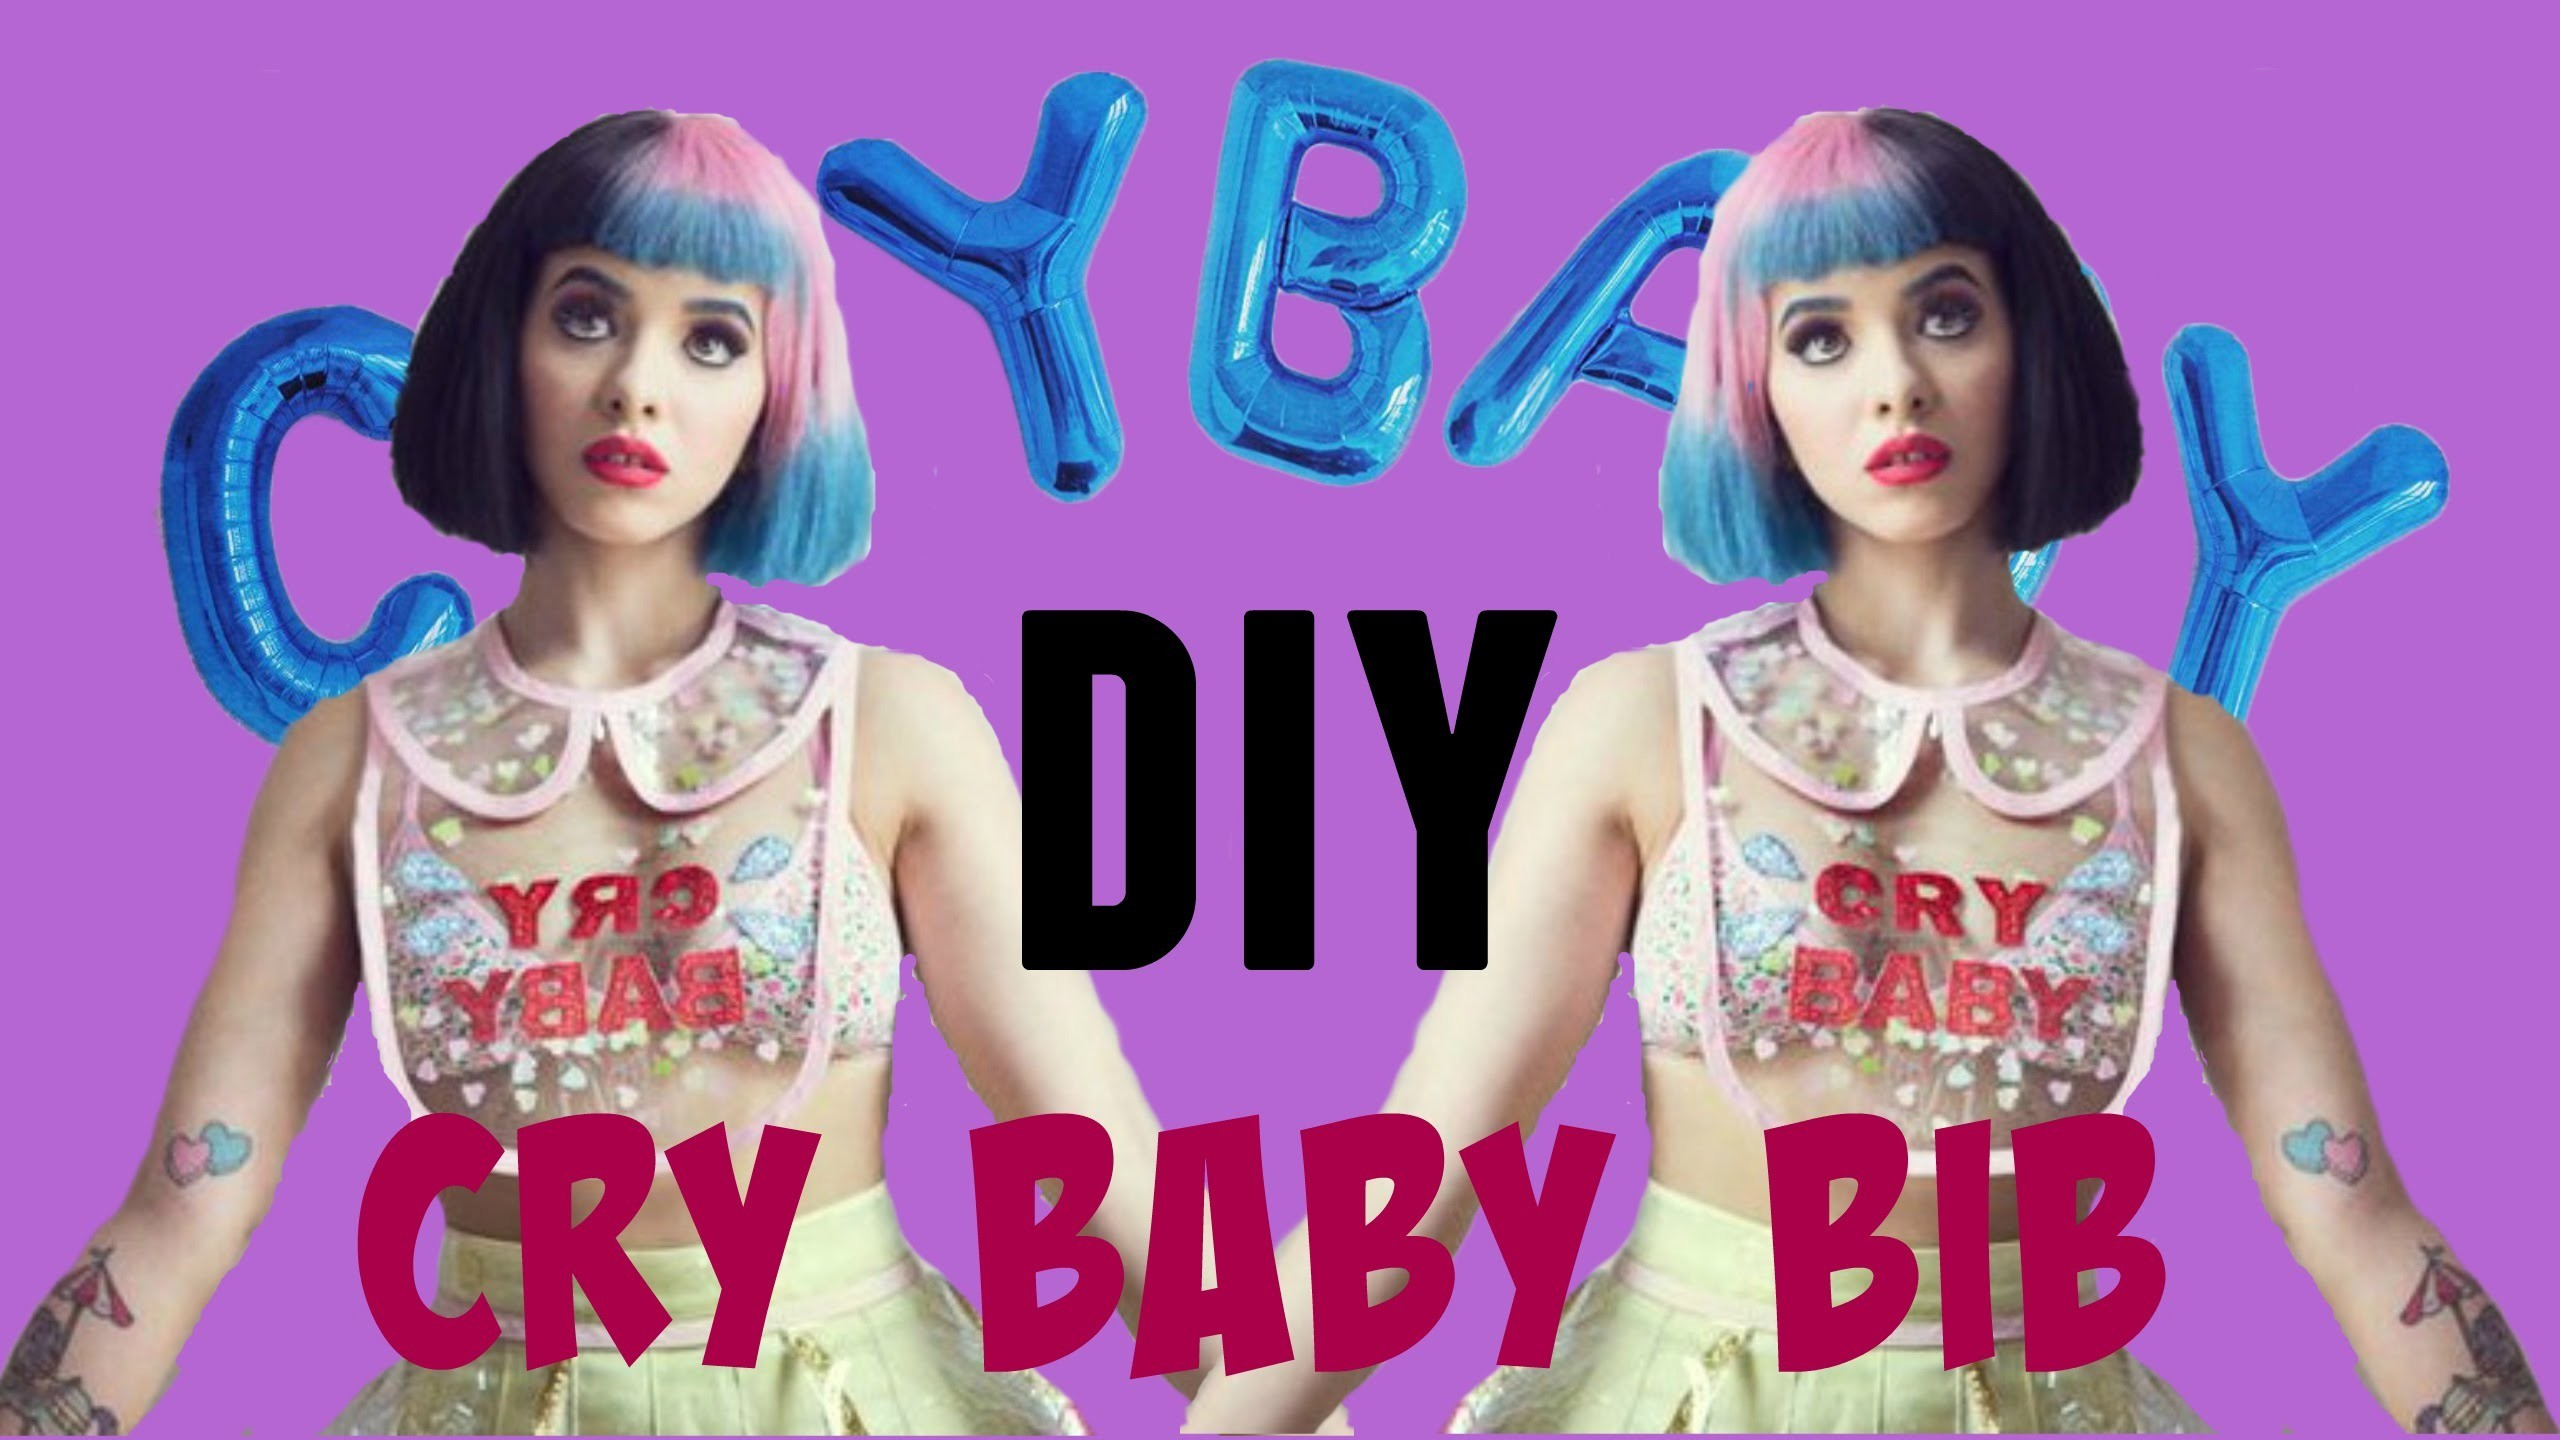 DIY Melanie Martinez outfit | Cry Baby bib | Fake it to make it #6 – YouTube